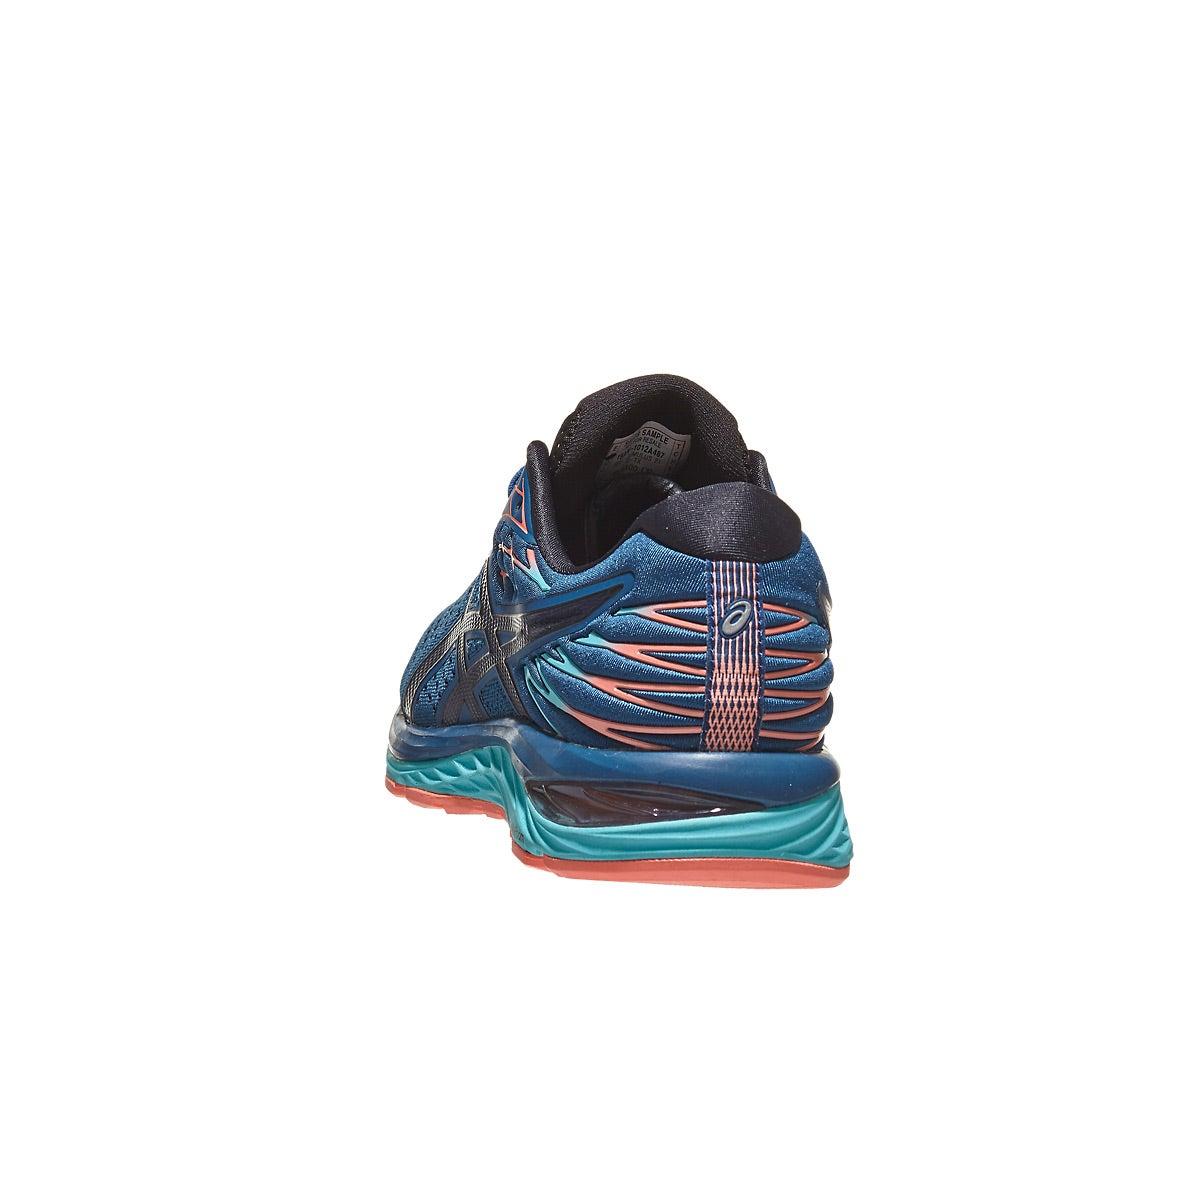 ASICS Gel Cumulus 21 GTX Women's Shoes Mako Blue 360° View